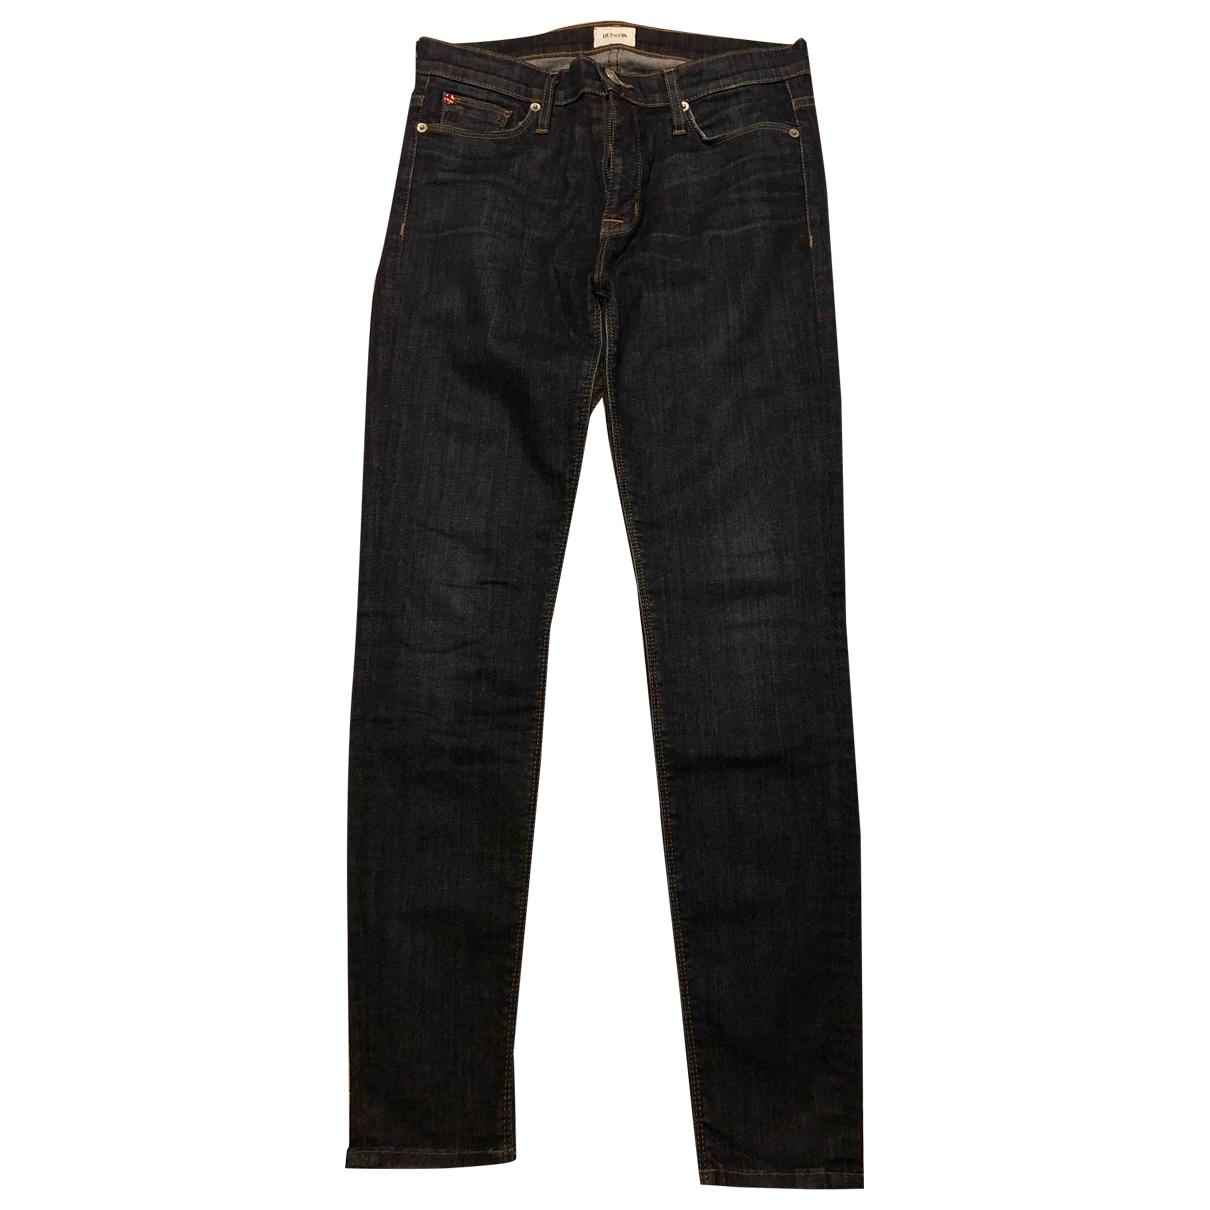 H By Hudson \N Blue Denim - Jeans Trousers for Women 10 UK